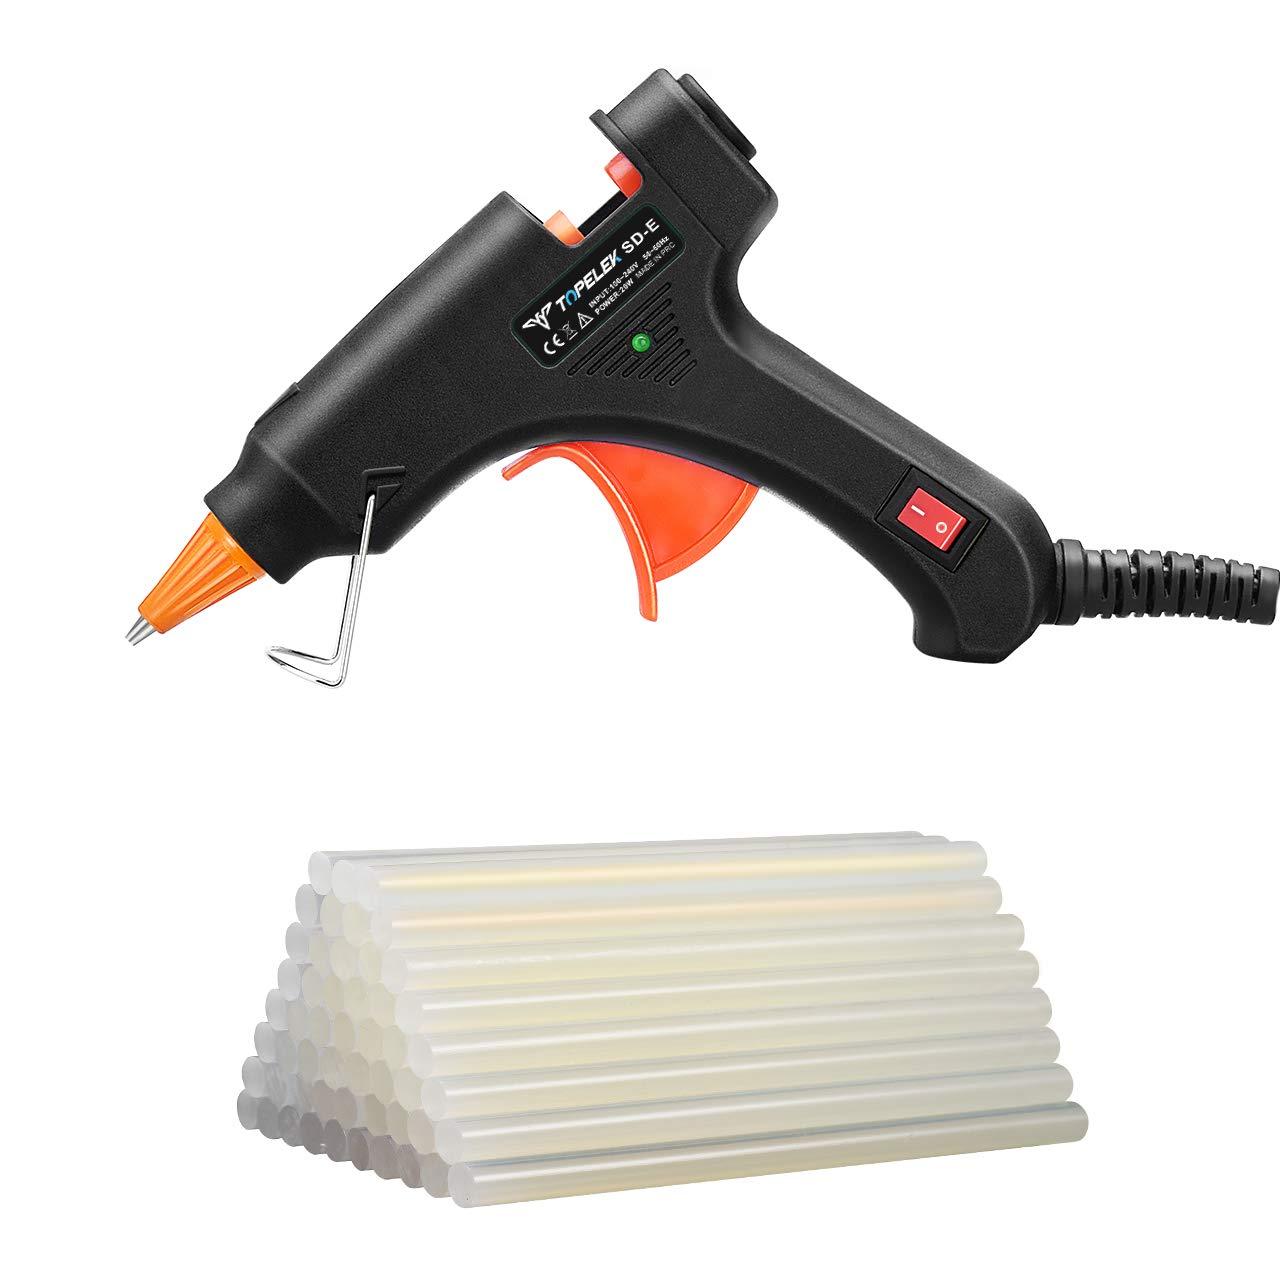 Glue Gun, TopElek Mini Hot Glue Gun with 50pcs Hot Glue Sticks, Melting Glue Gun Set for School DIY Arts and Crafts Projects, Home Quick Repairs(20 Watts, Black)